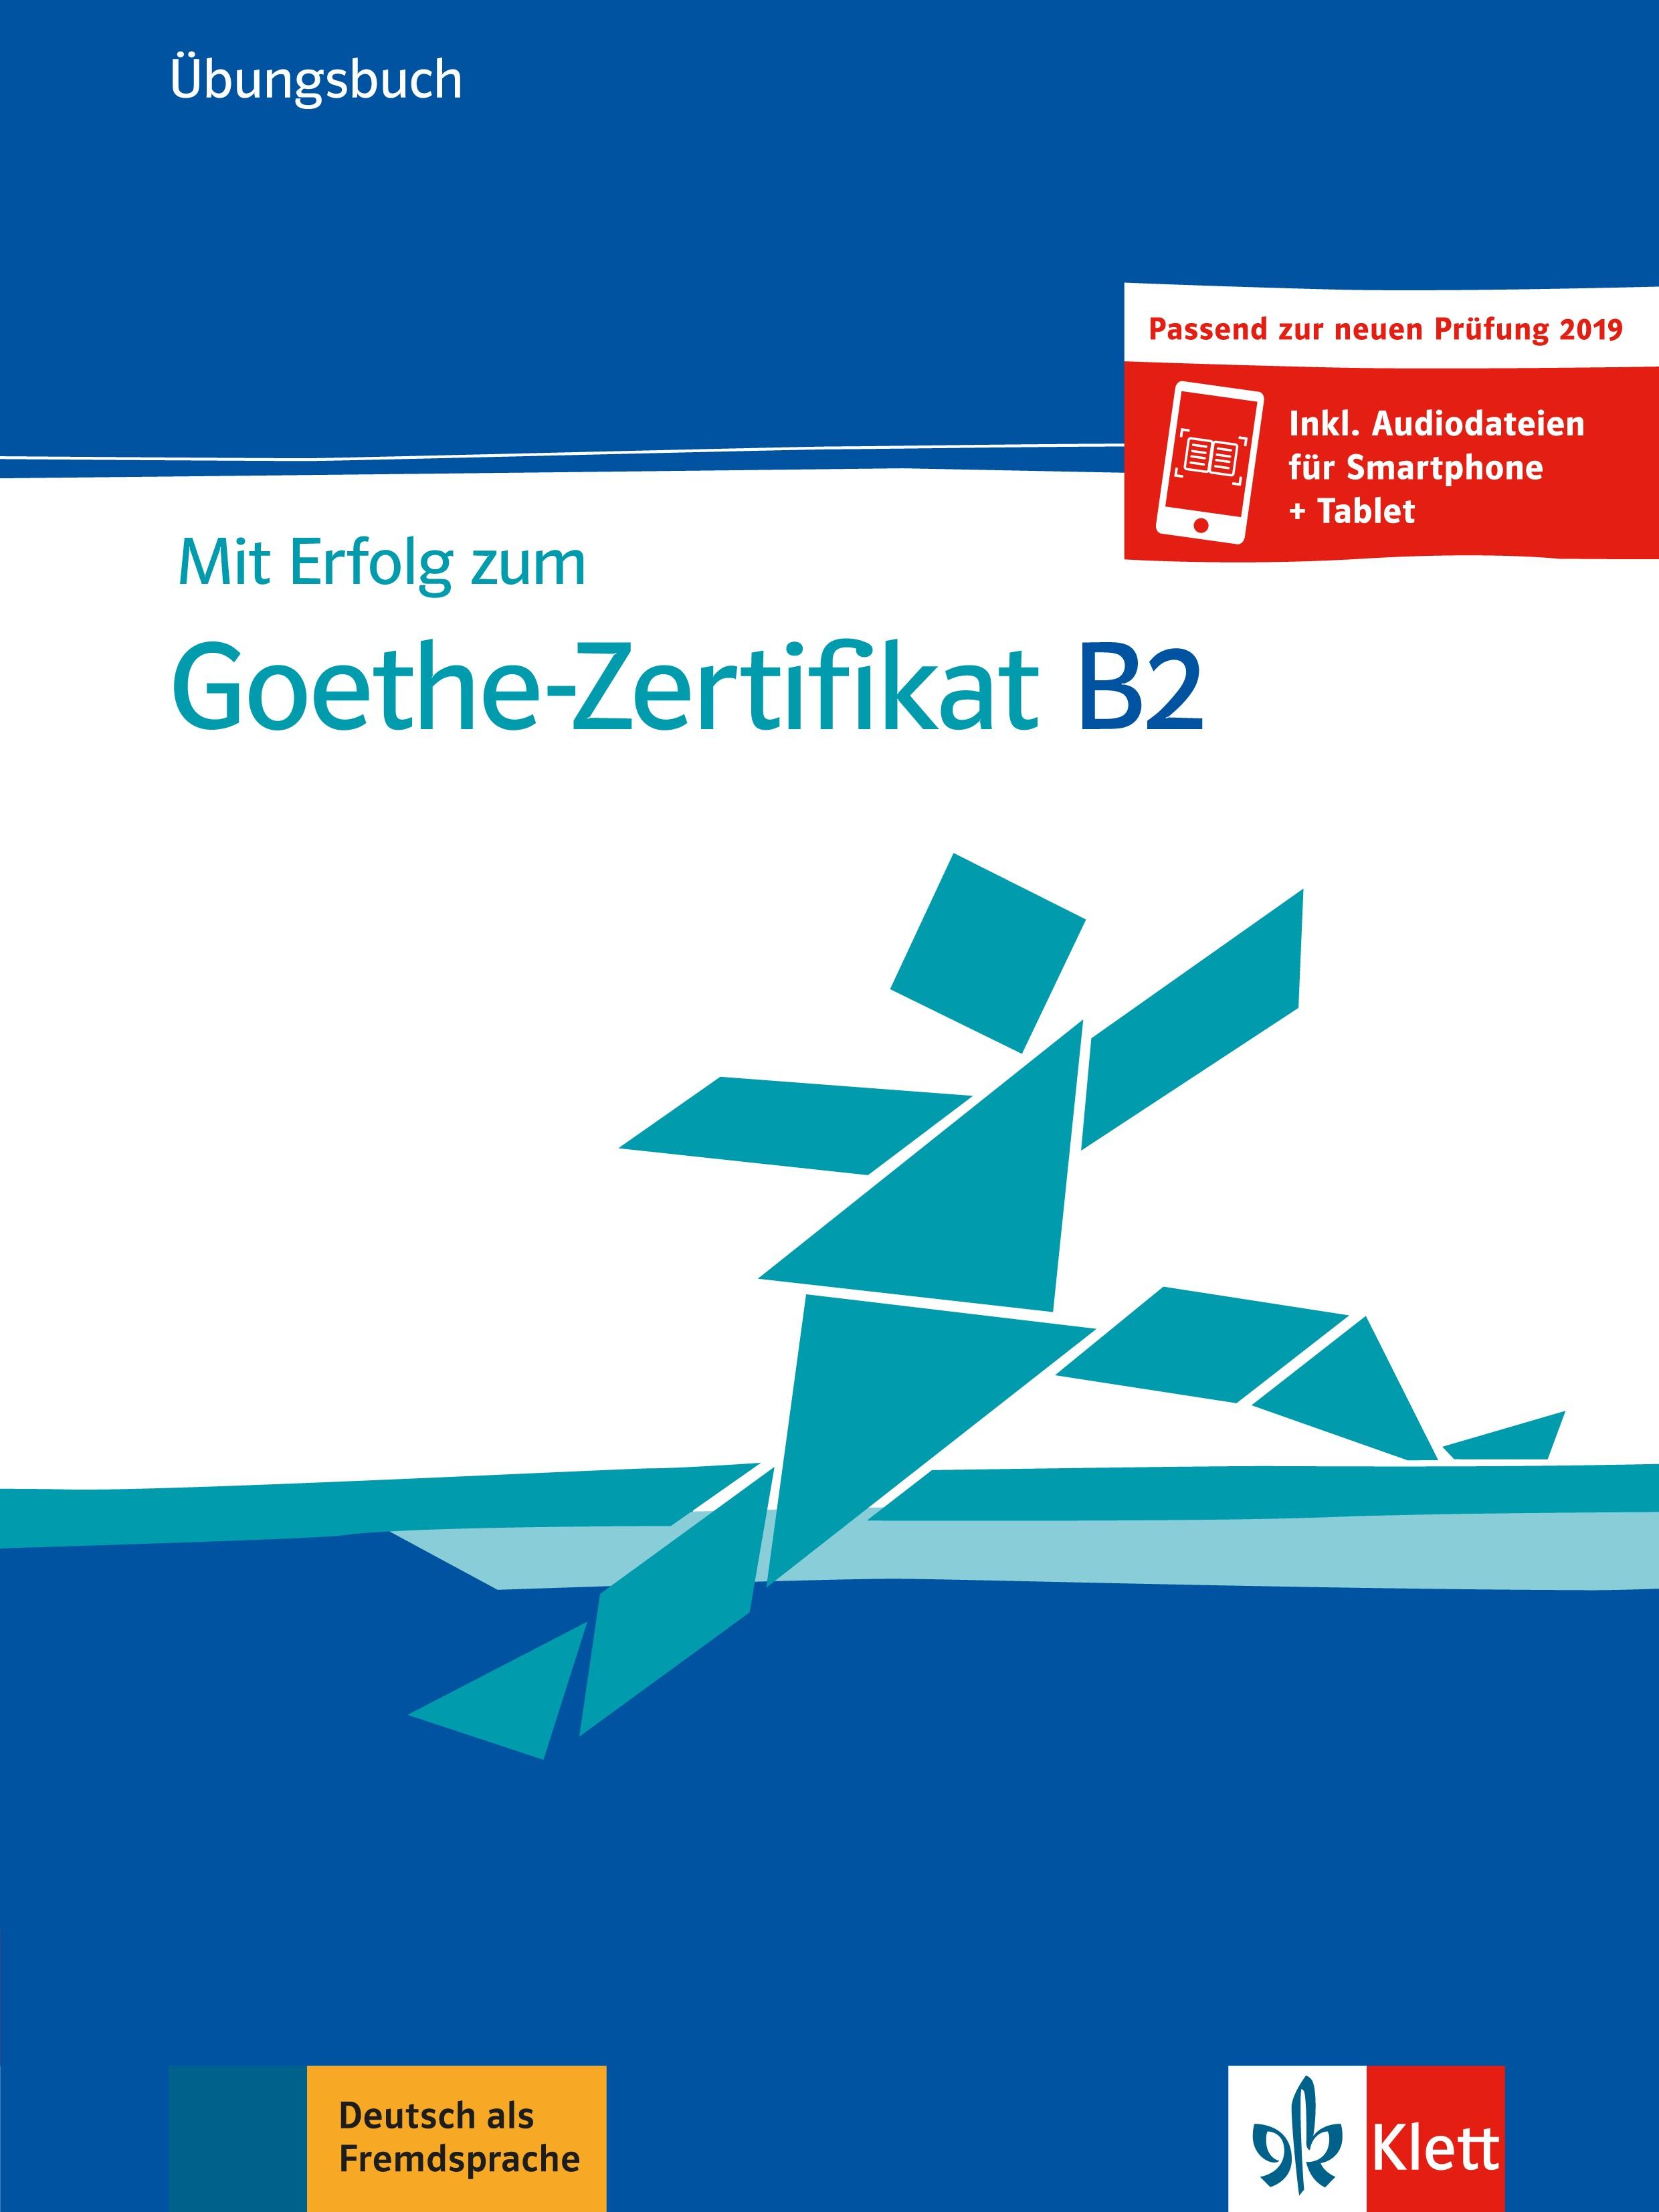 Mit Erfolg zum Goethe Zertifikat B2 Übungsbuch نشر راین